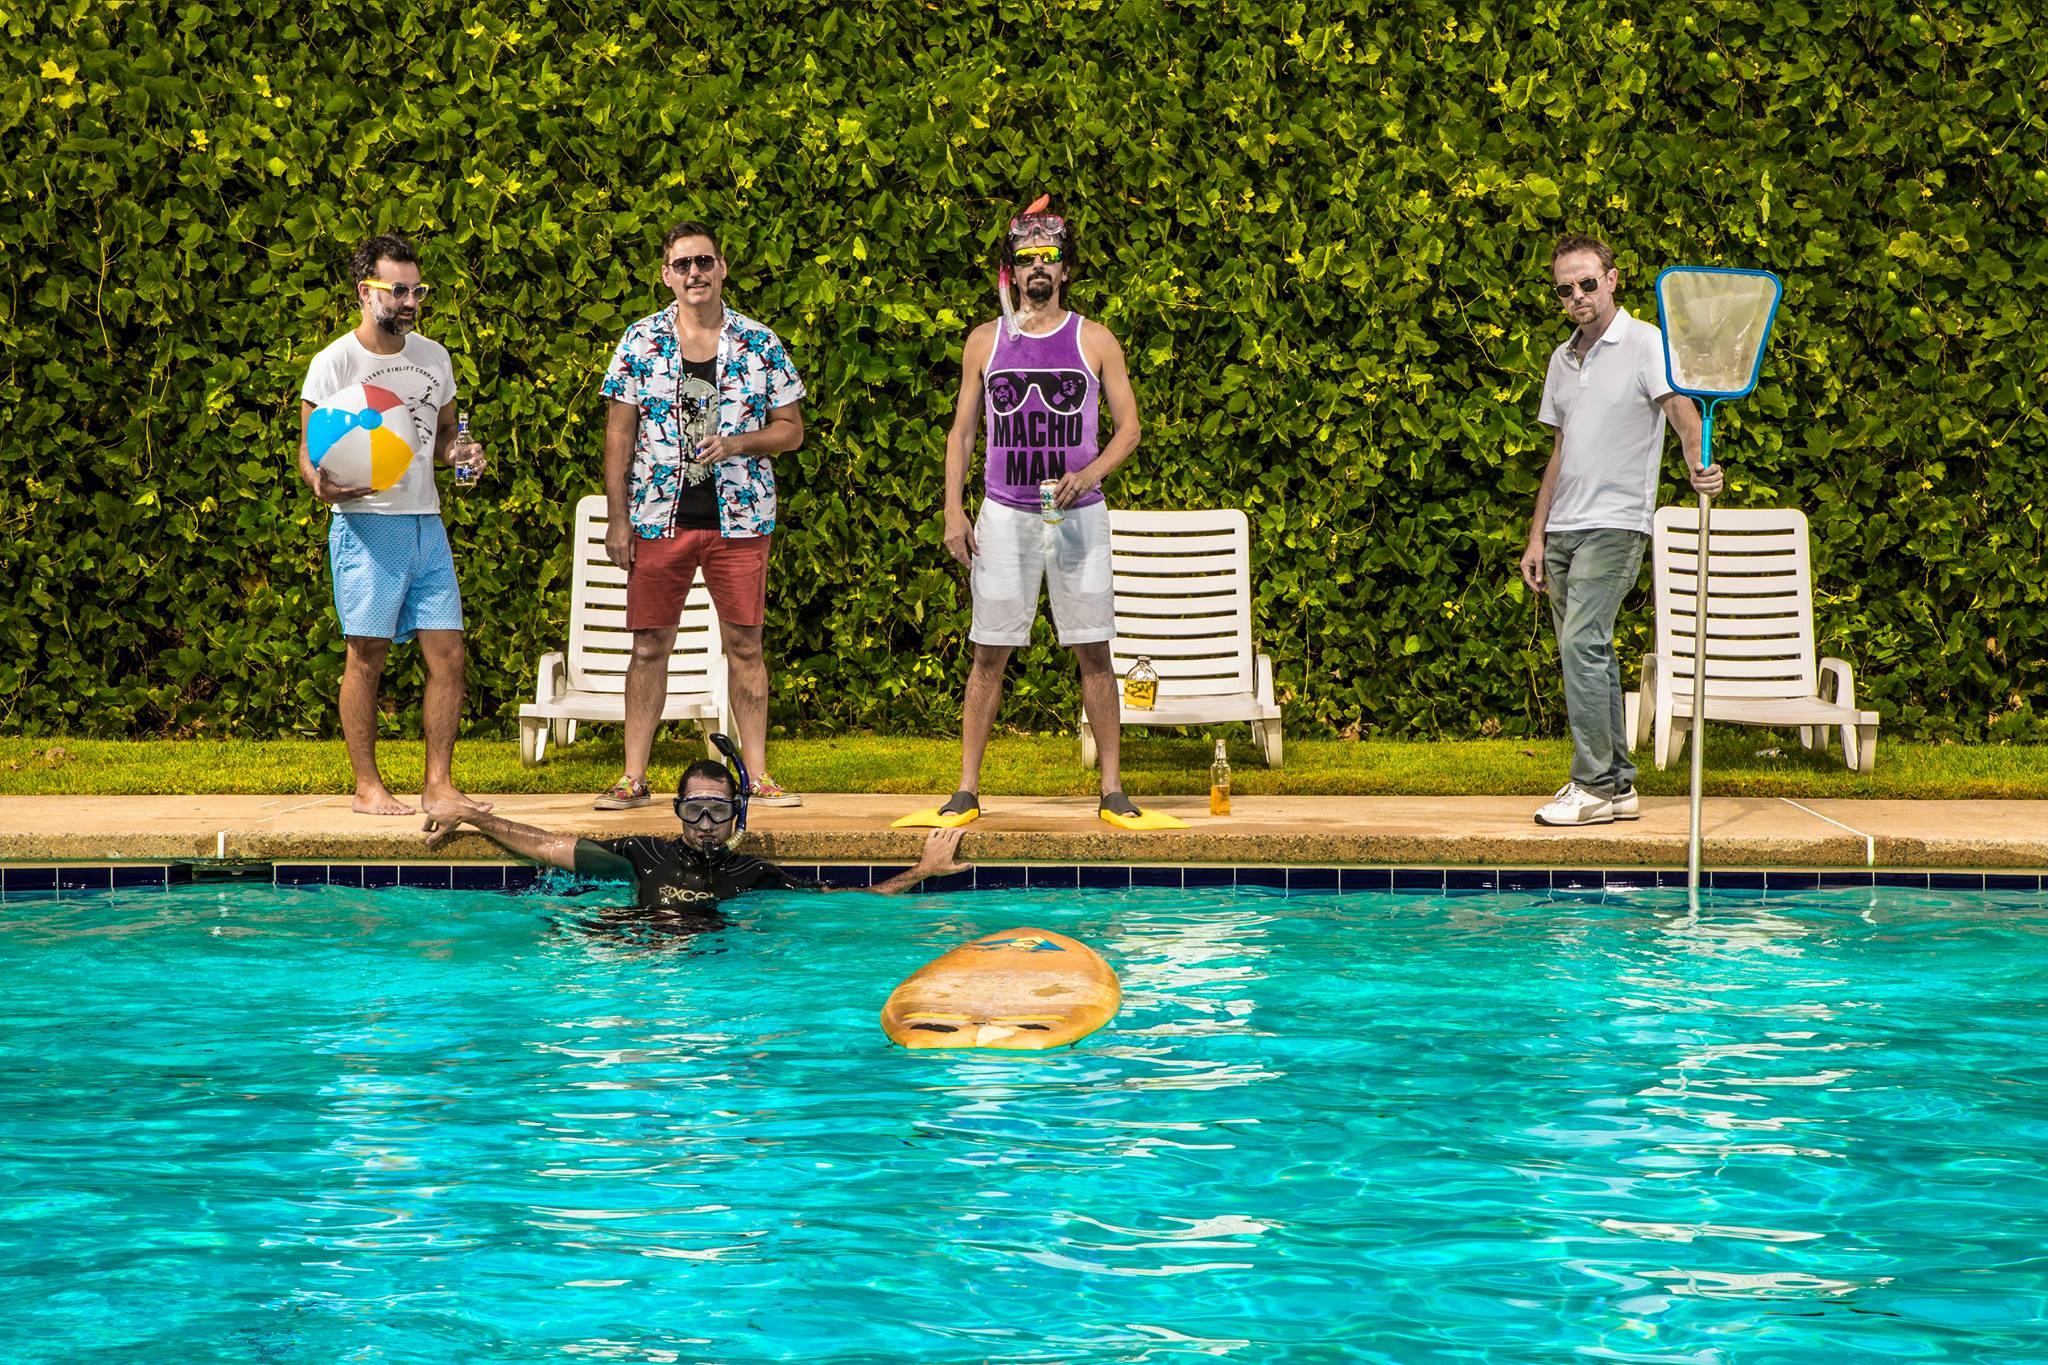 My Radio left to right: Brett Winter Lemon, Hunter Johnson, JP Powell, Jeff Hofmann and Jake Zuckerman (in the pool)  .